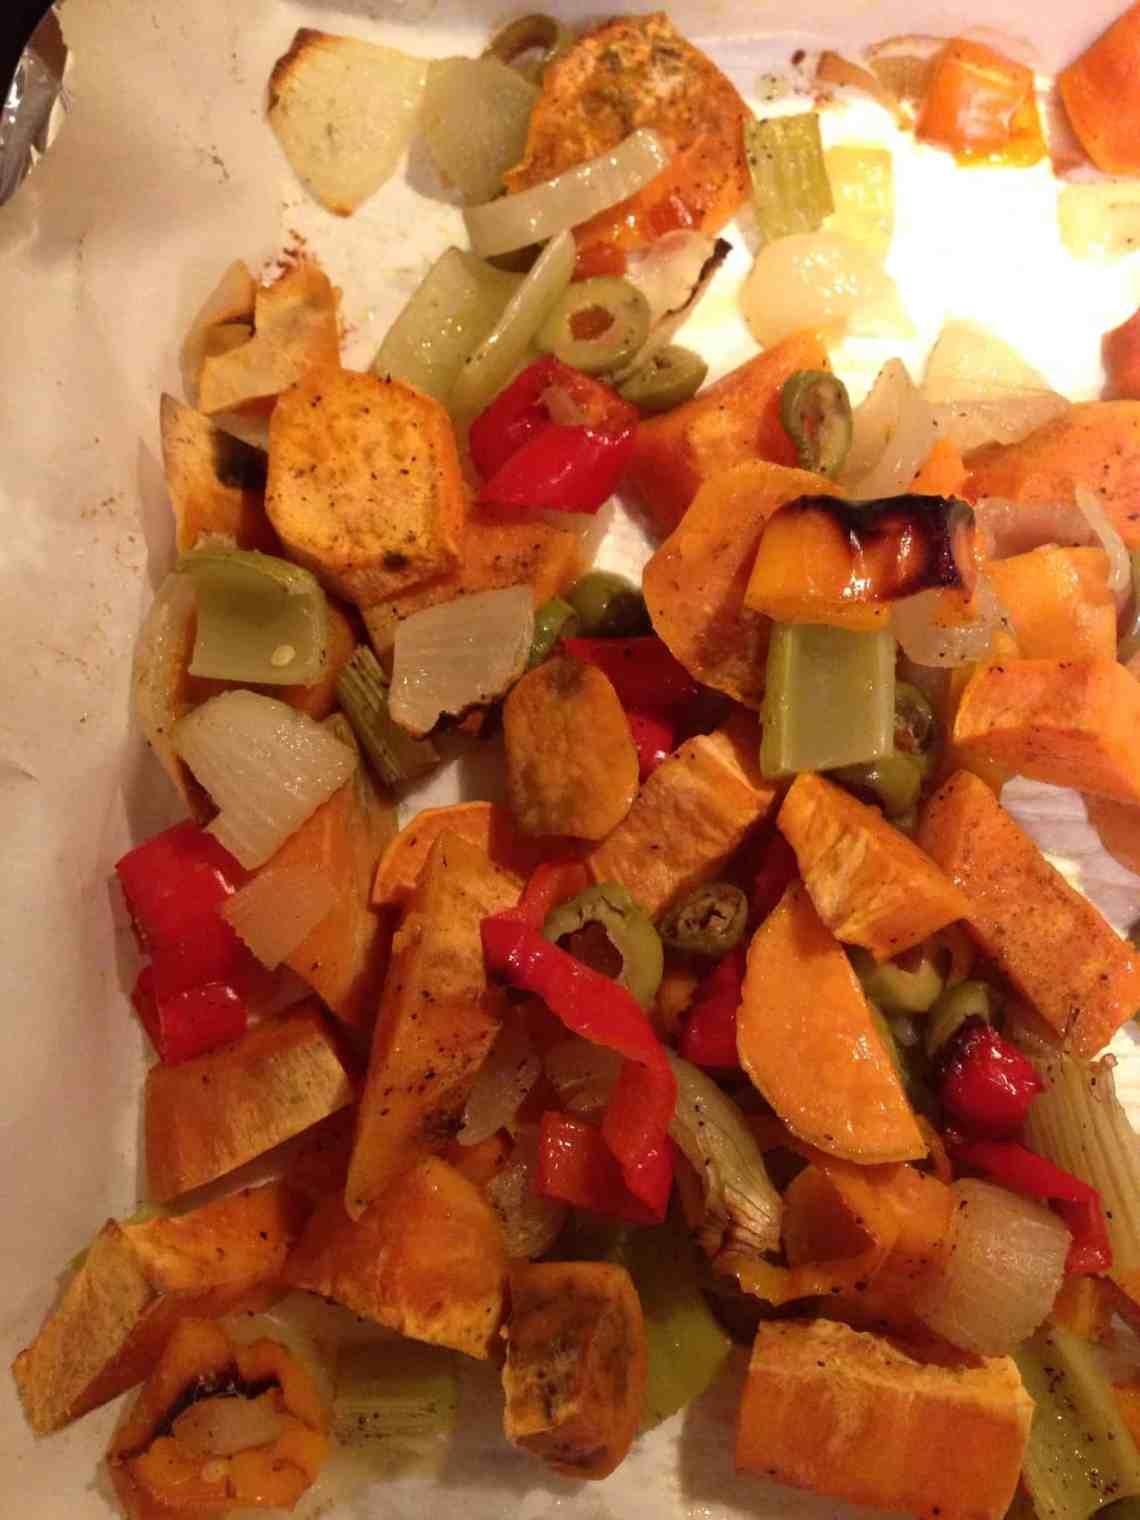 Roasted Winter Vegetables, Vegan, Gluten-Free